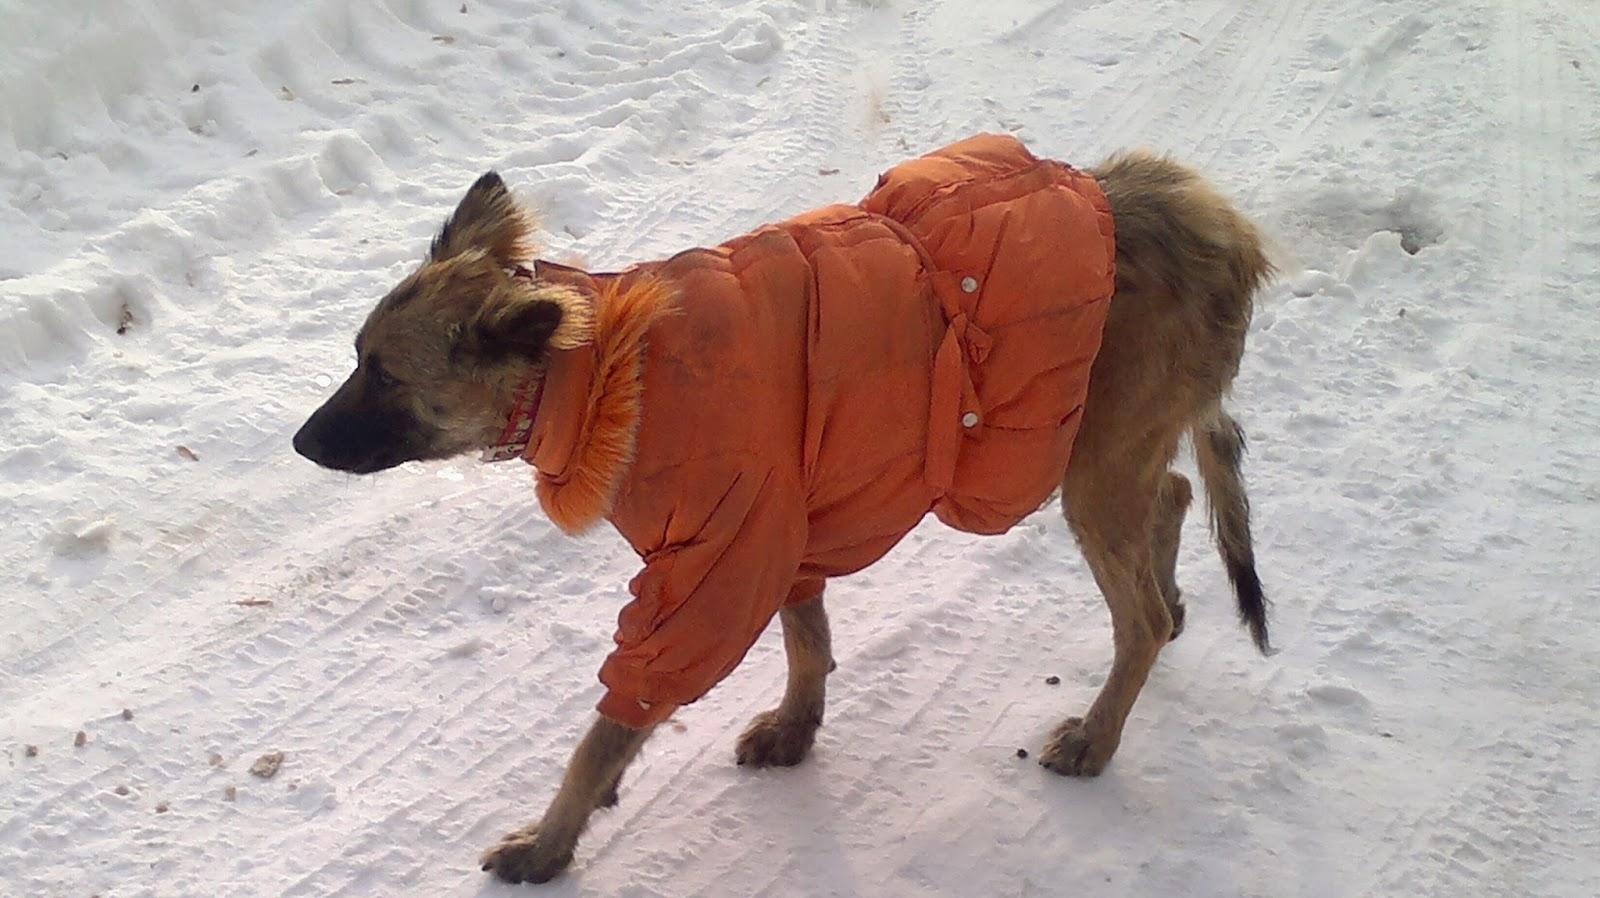 Холодно животным